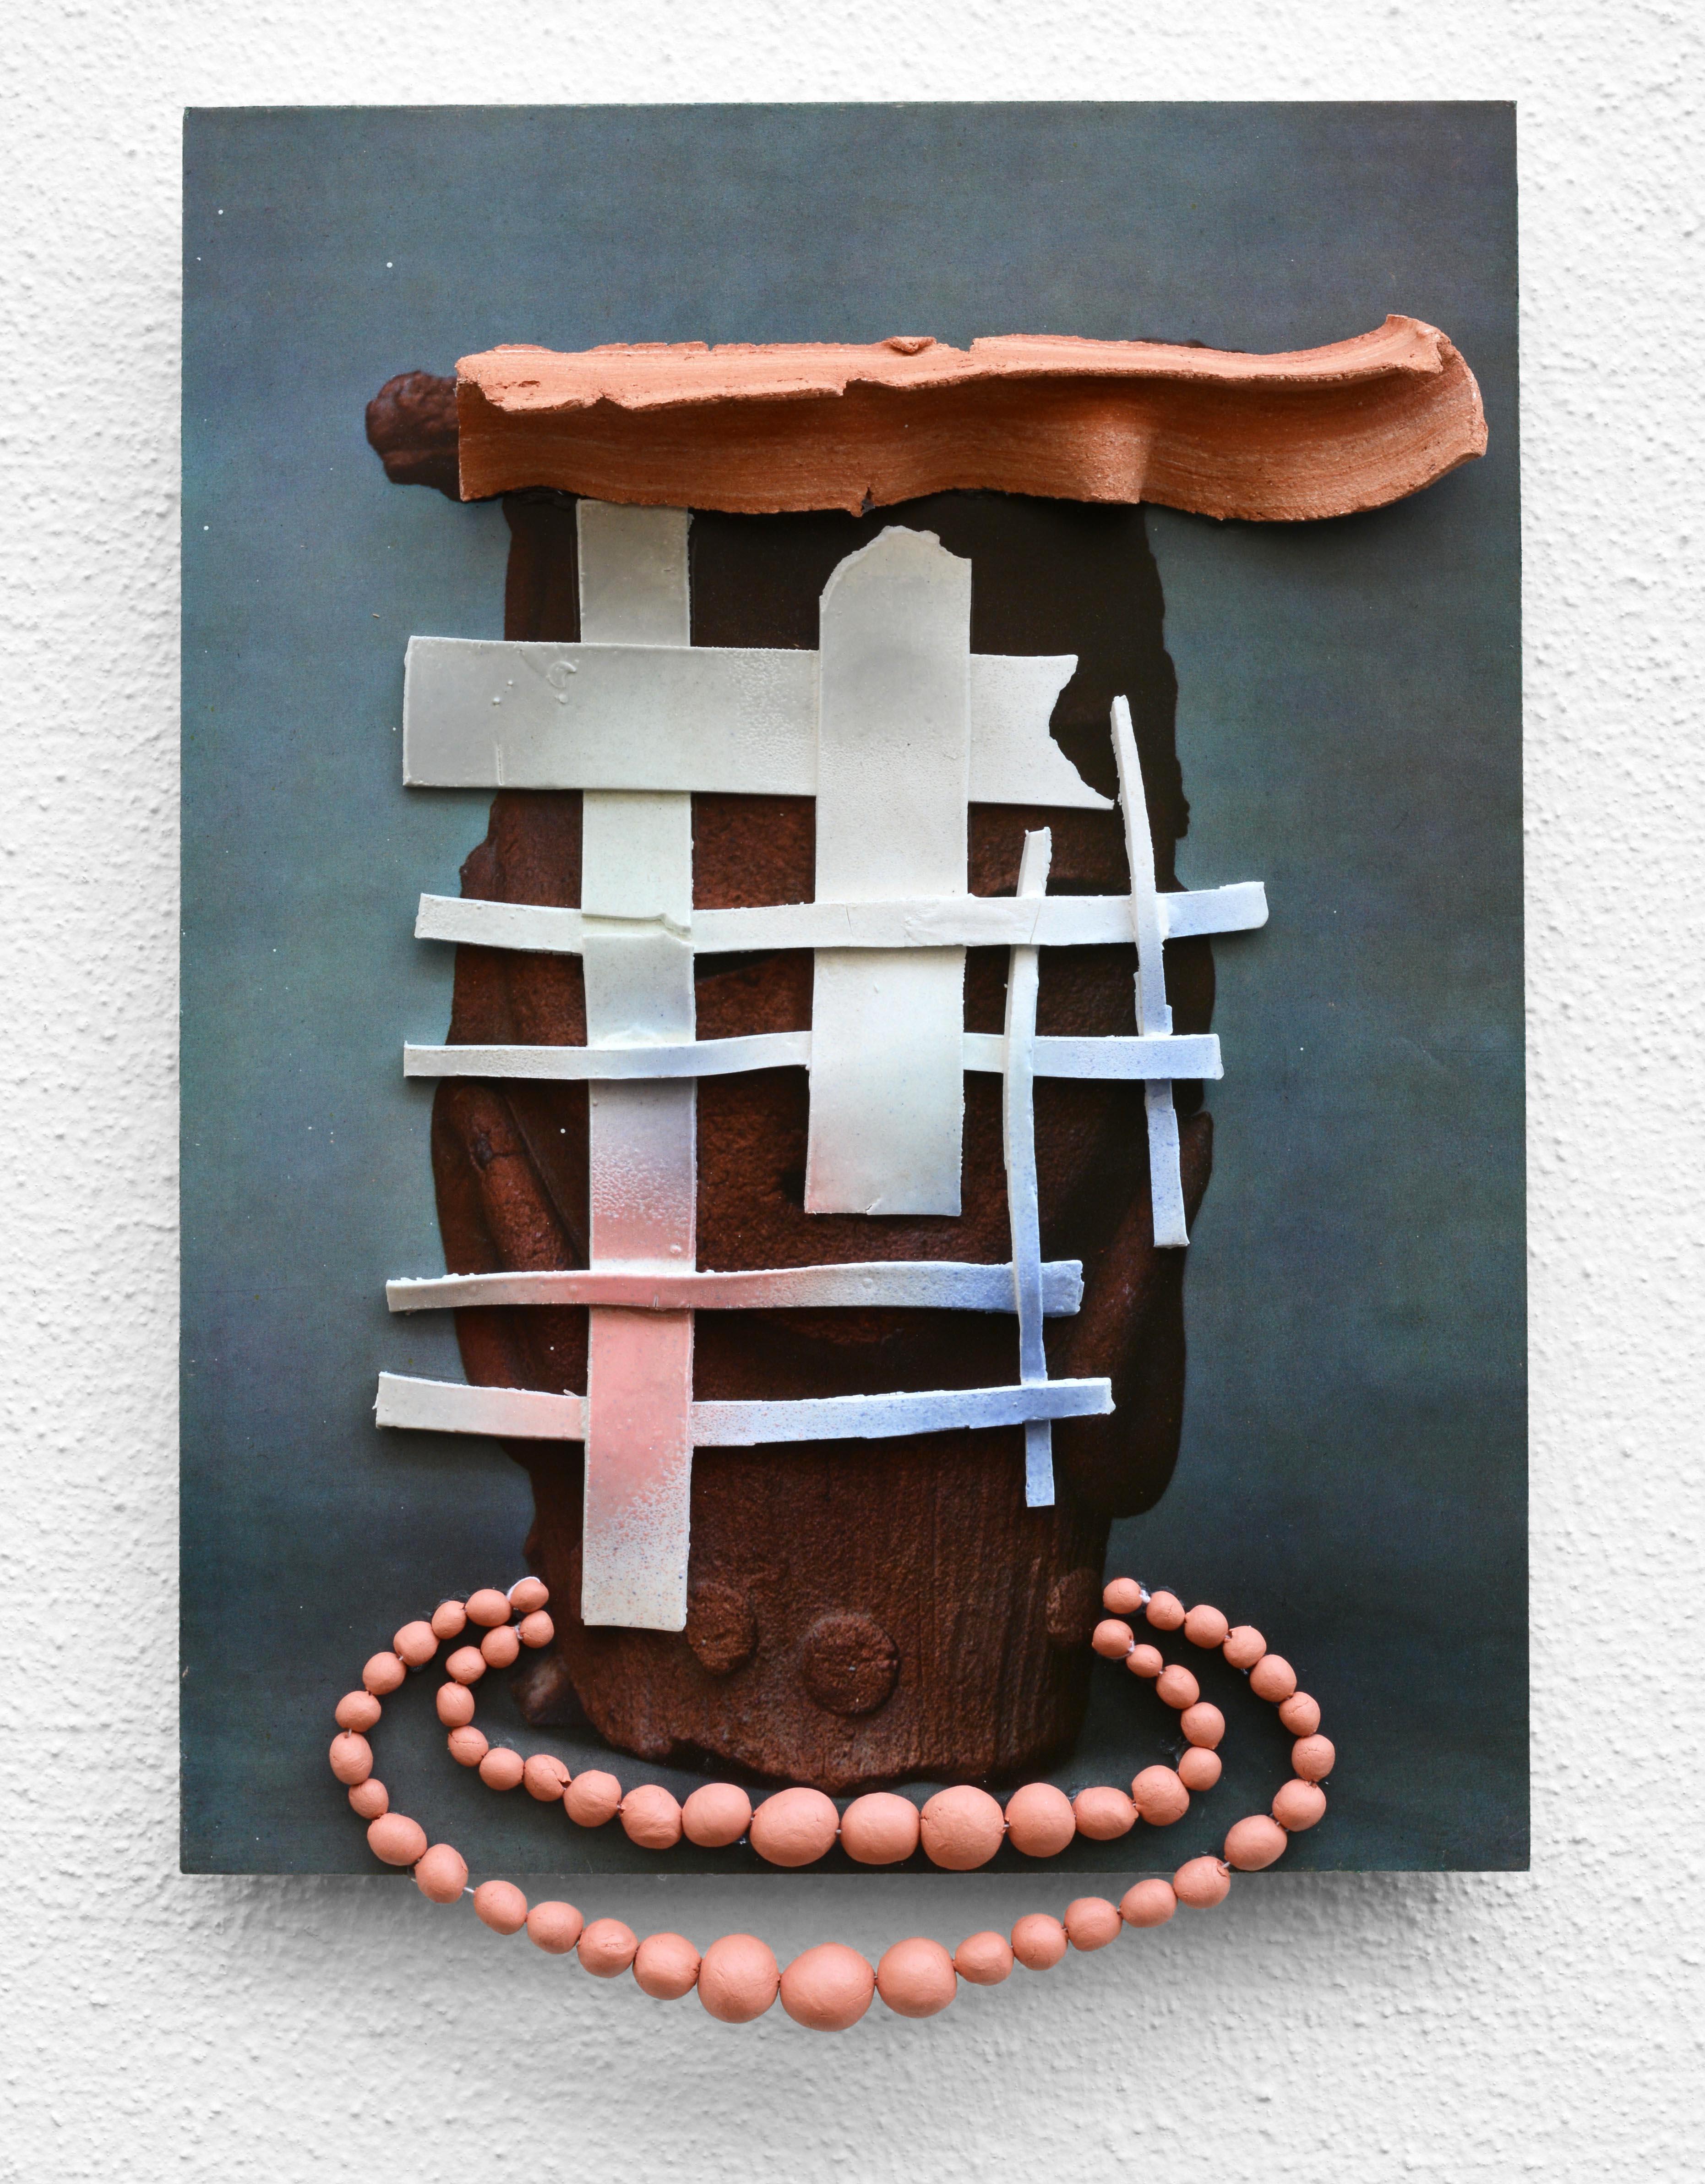 Courtesy of Asya Geisberg Gallery